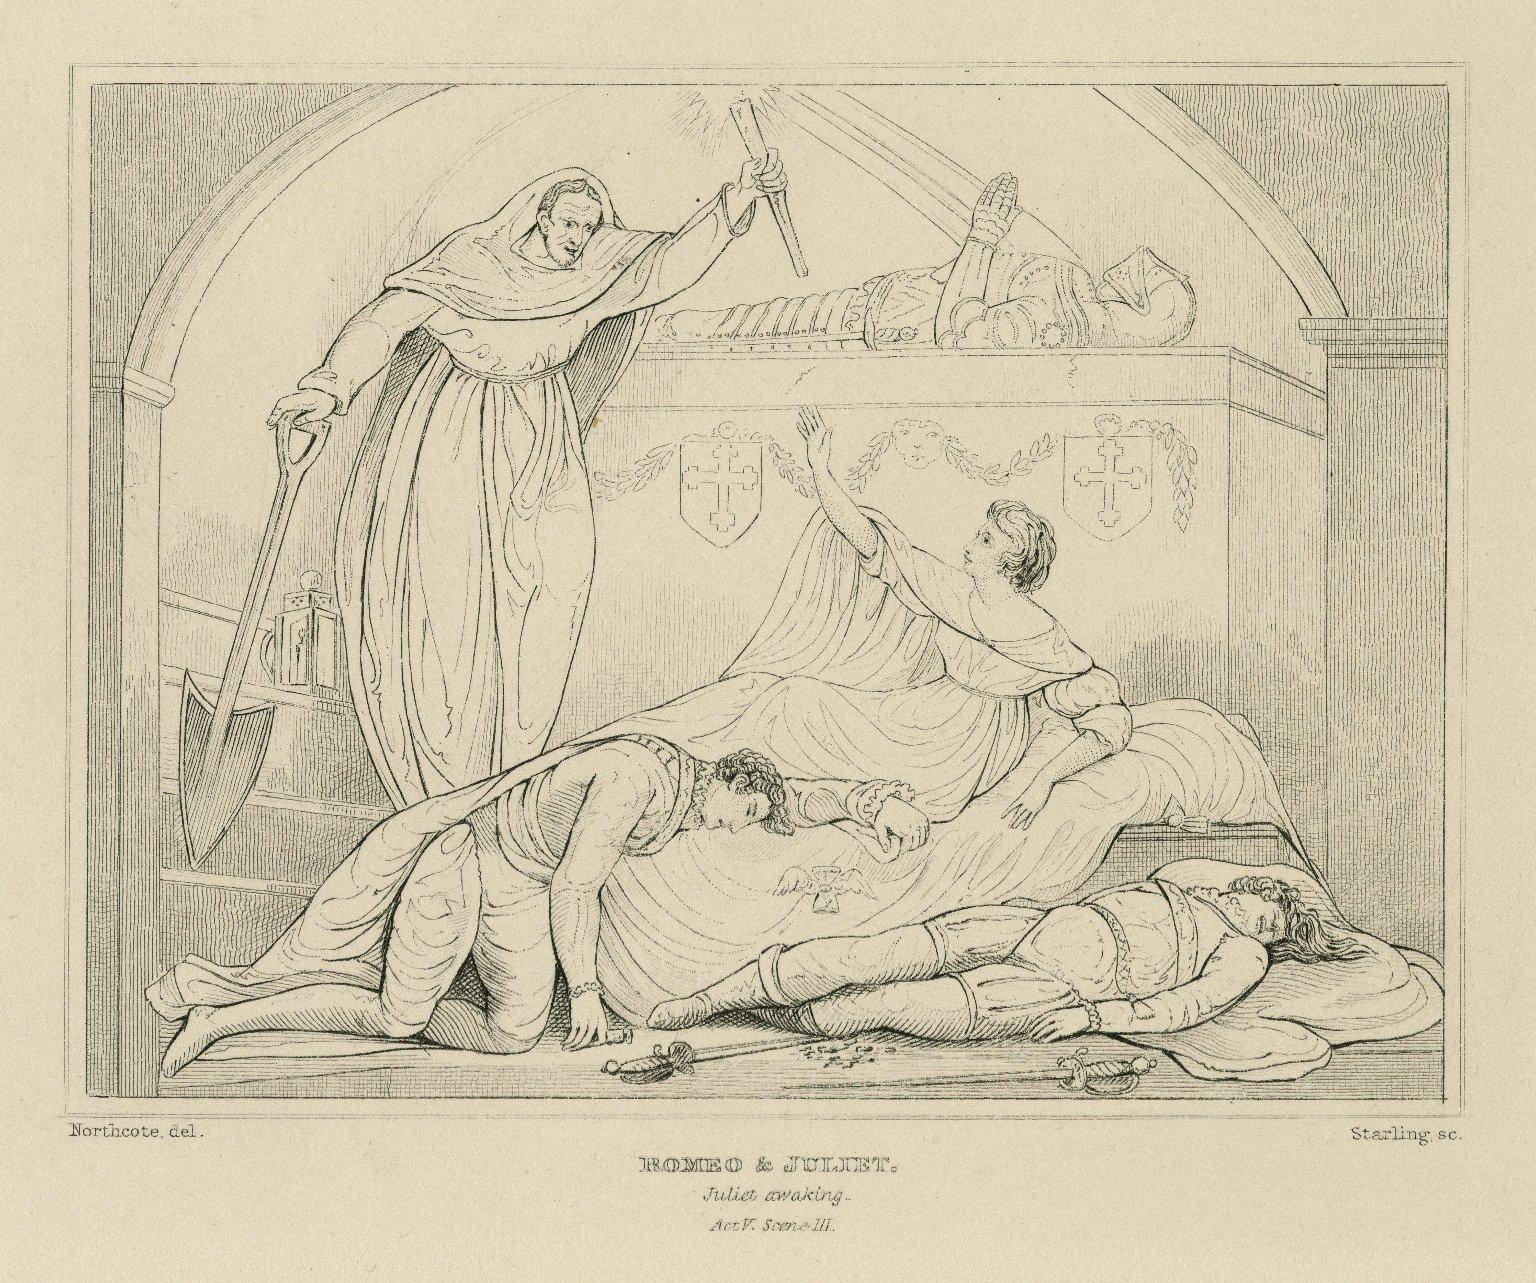 Romeo & Juliet, Juliet awaking, act V, scene III [graphic] / Northcote, del. ; Starling, sc.